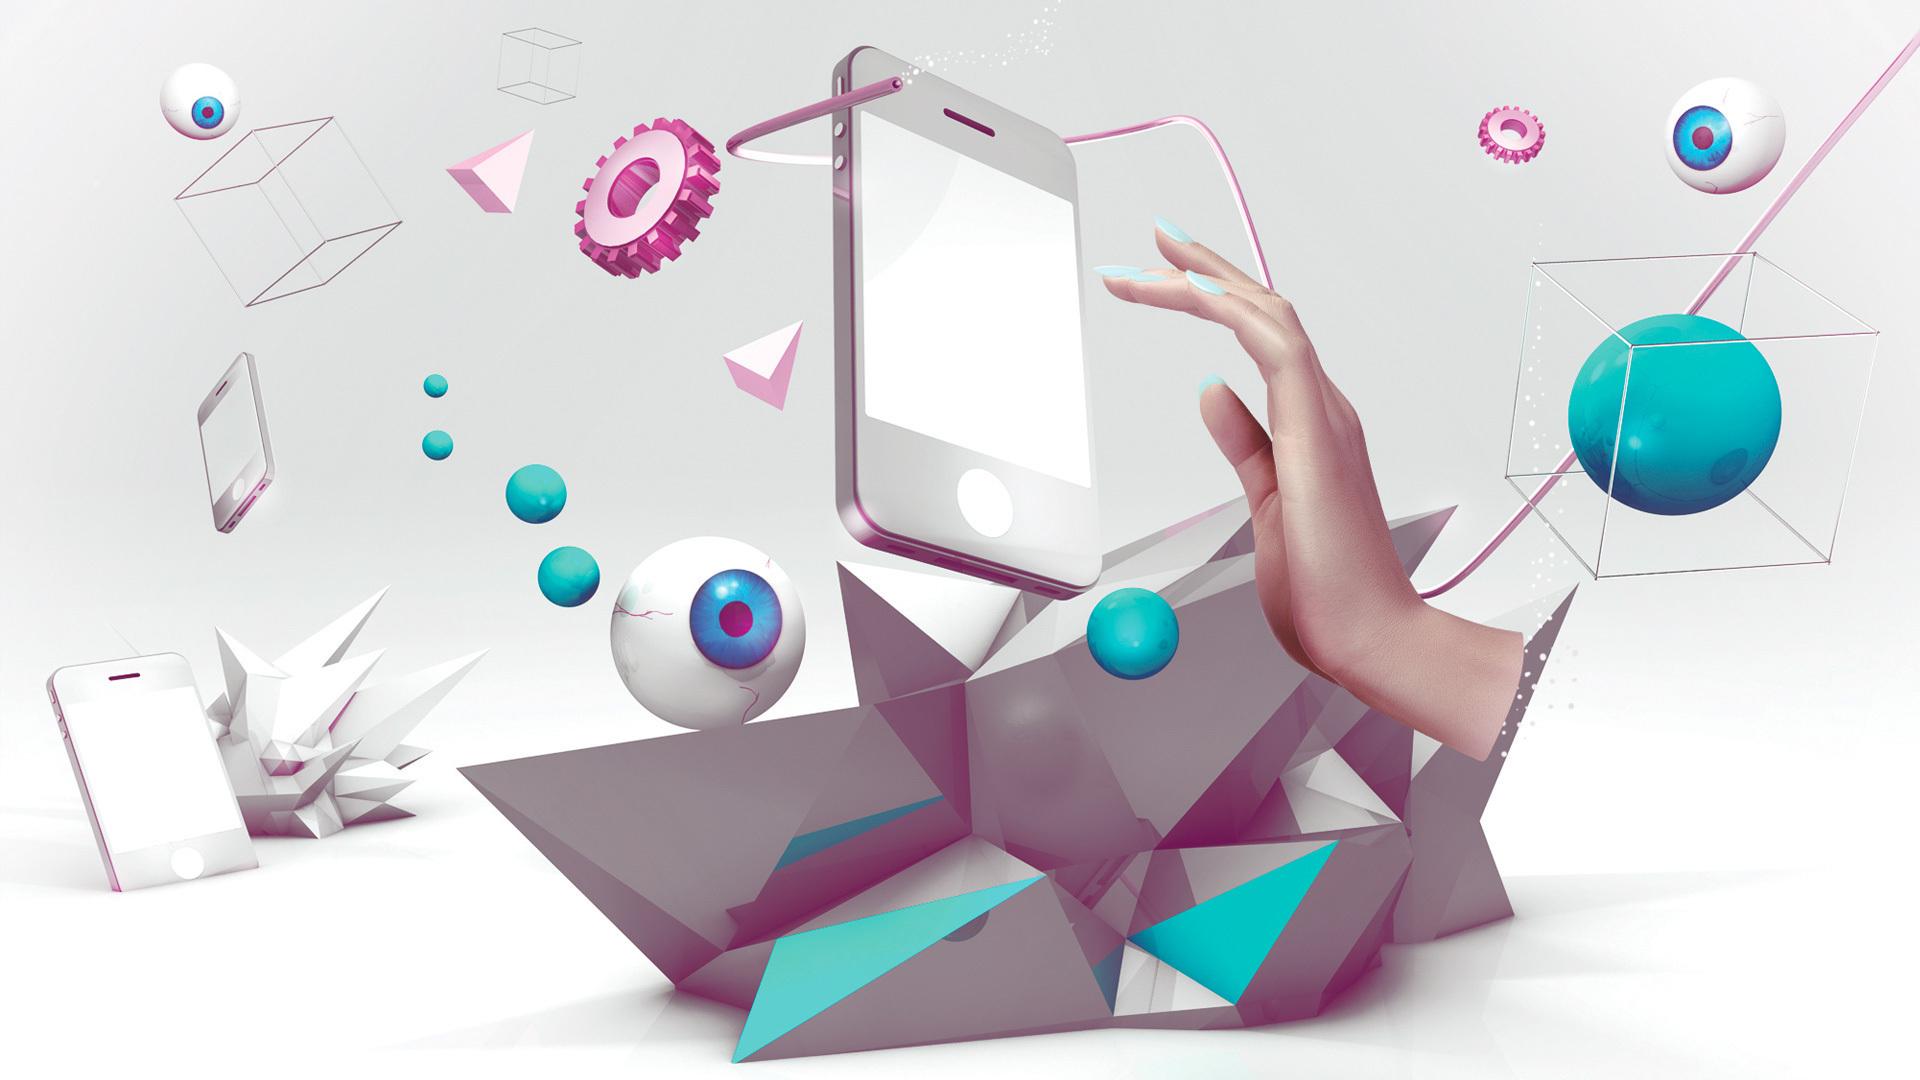 Картинки для презентации сайта девушка опубликовала